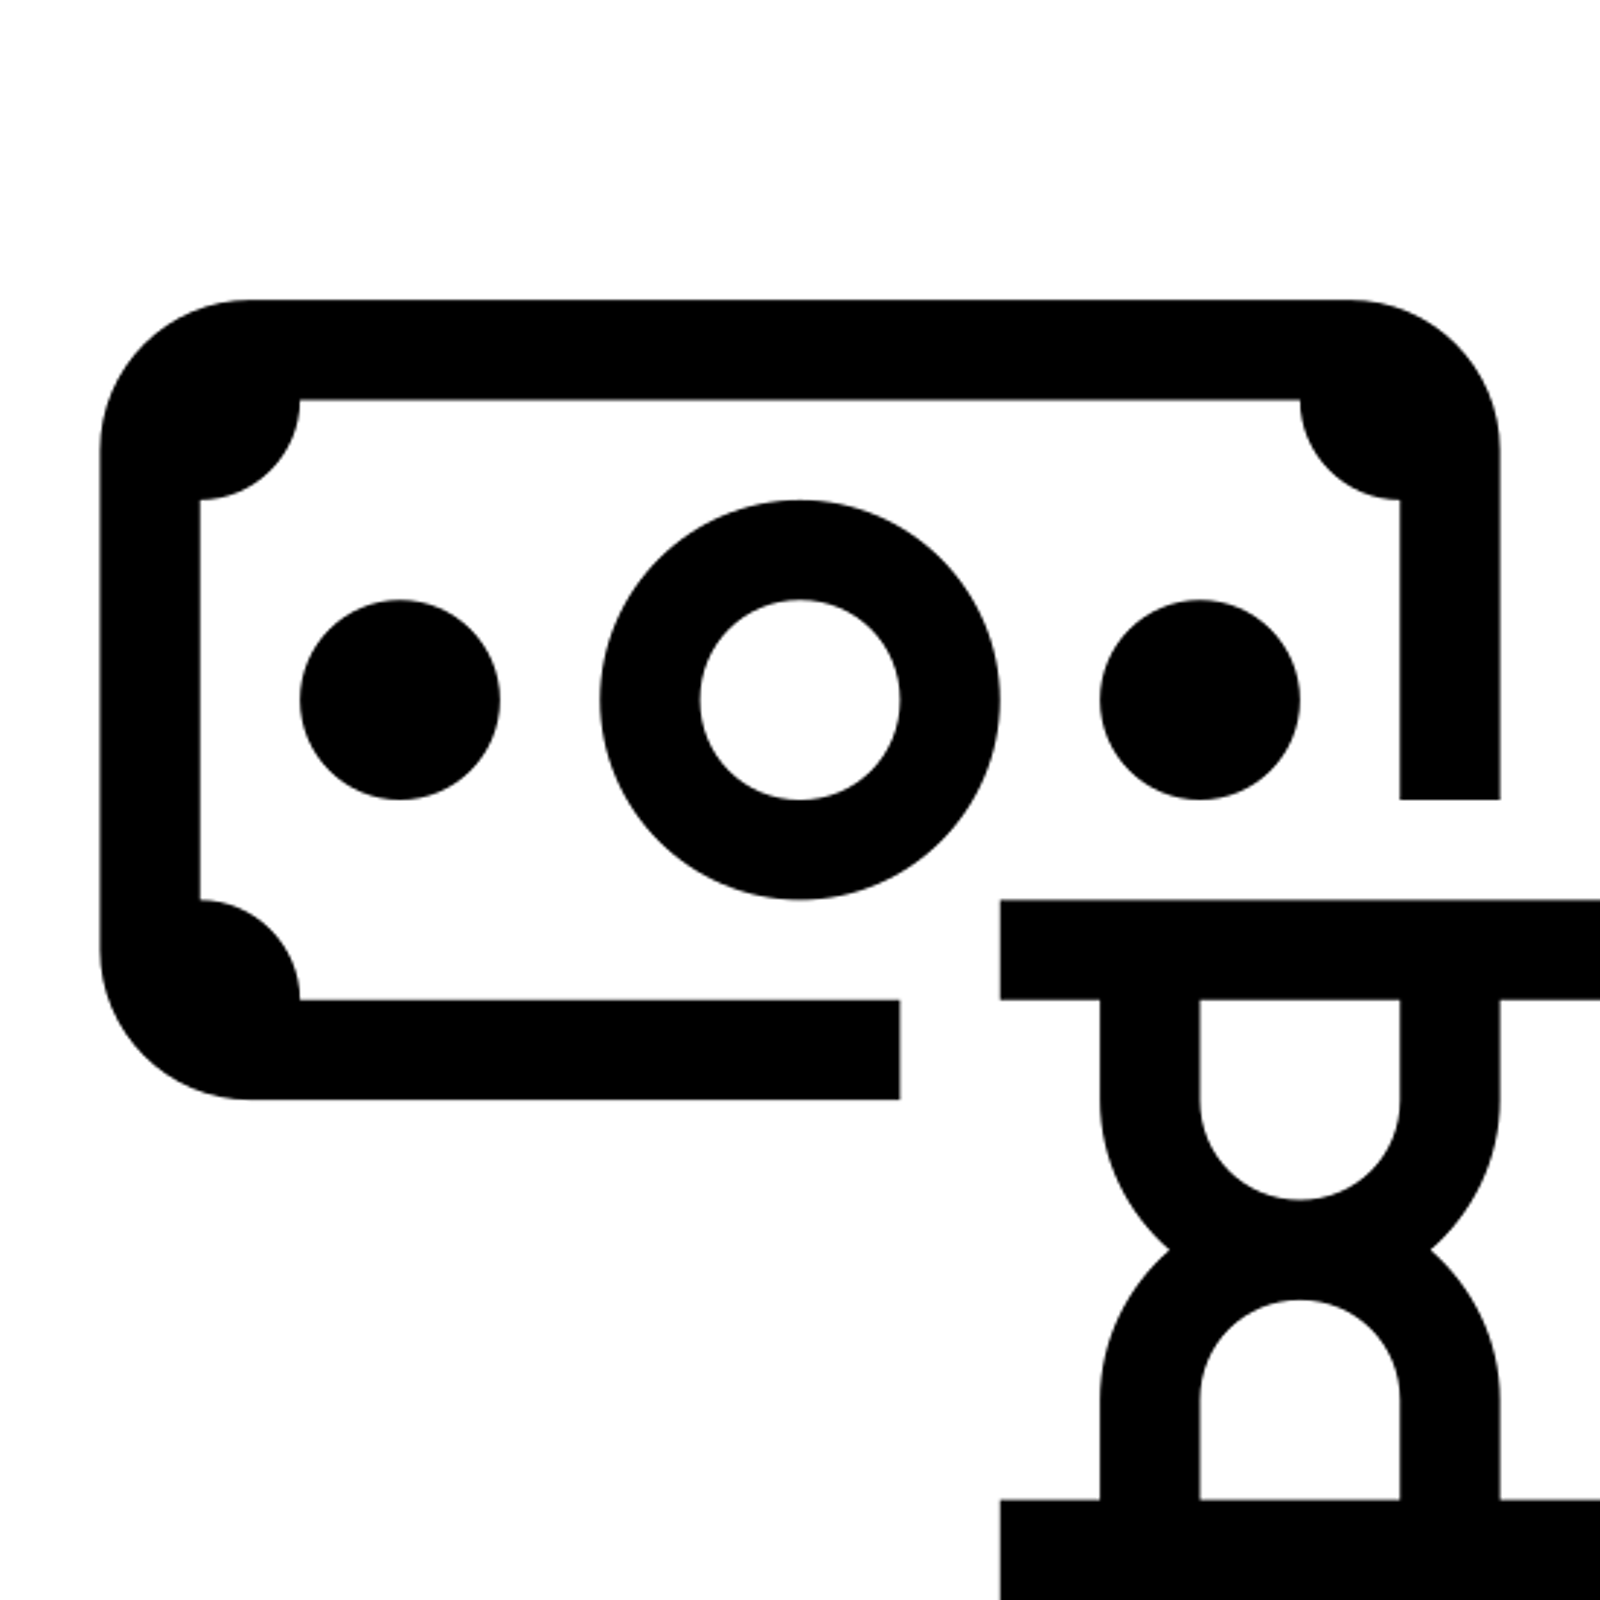 История платежей icon